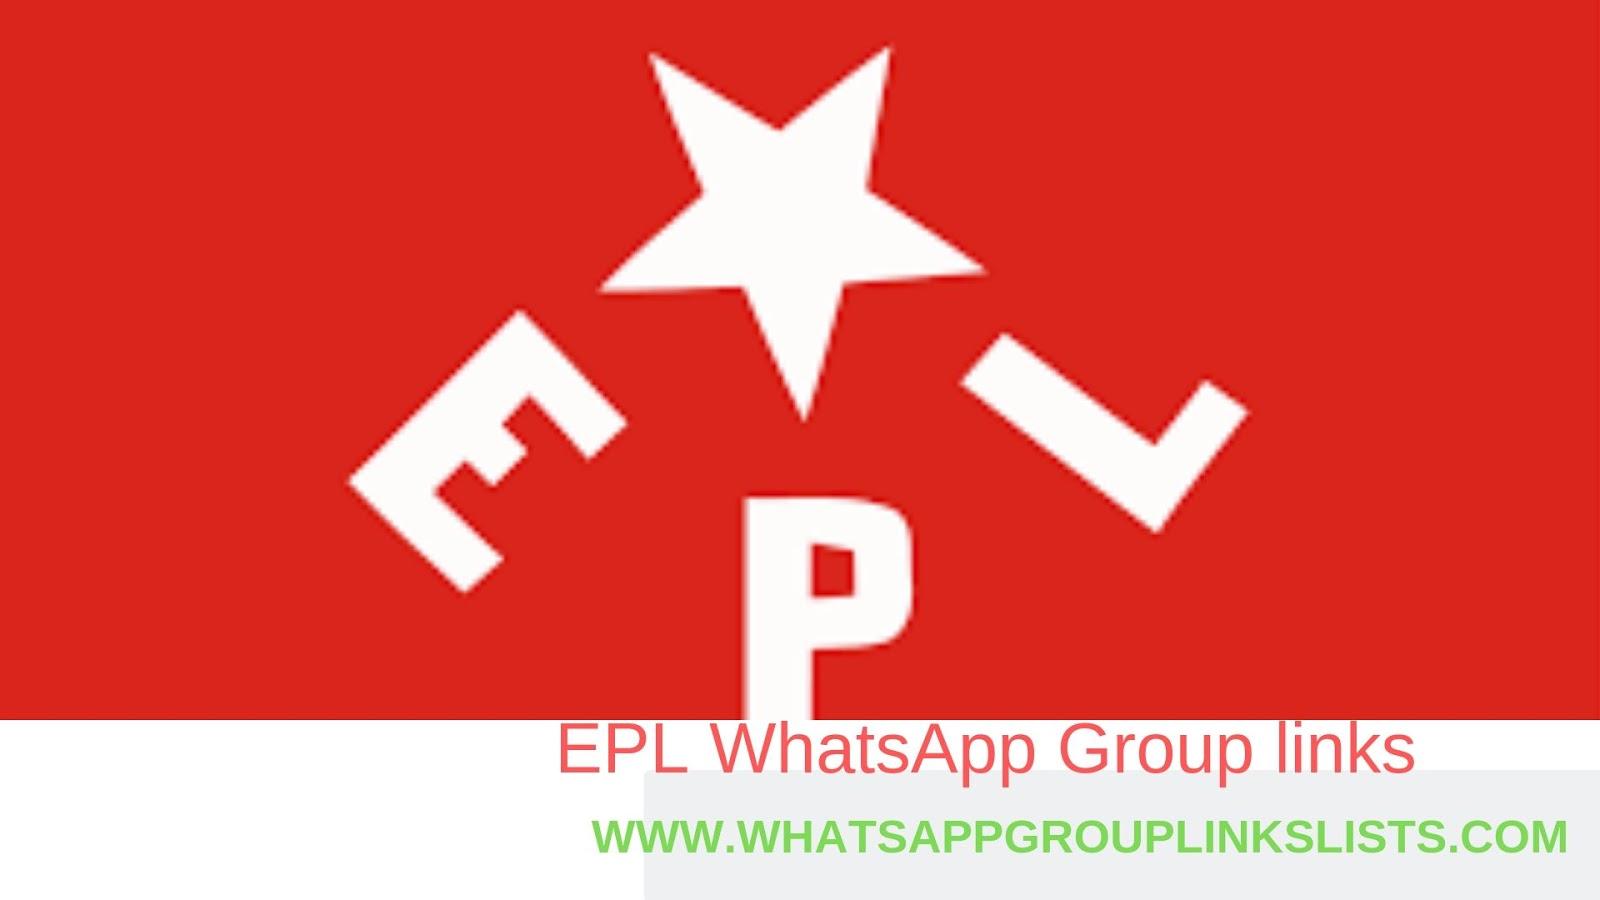 Join EPL WhatsApp Group Links List